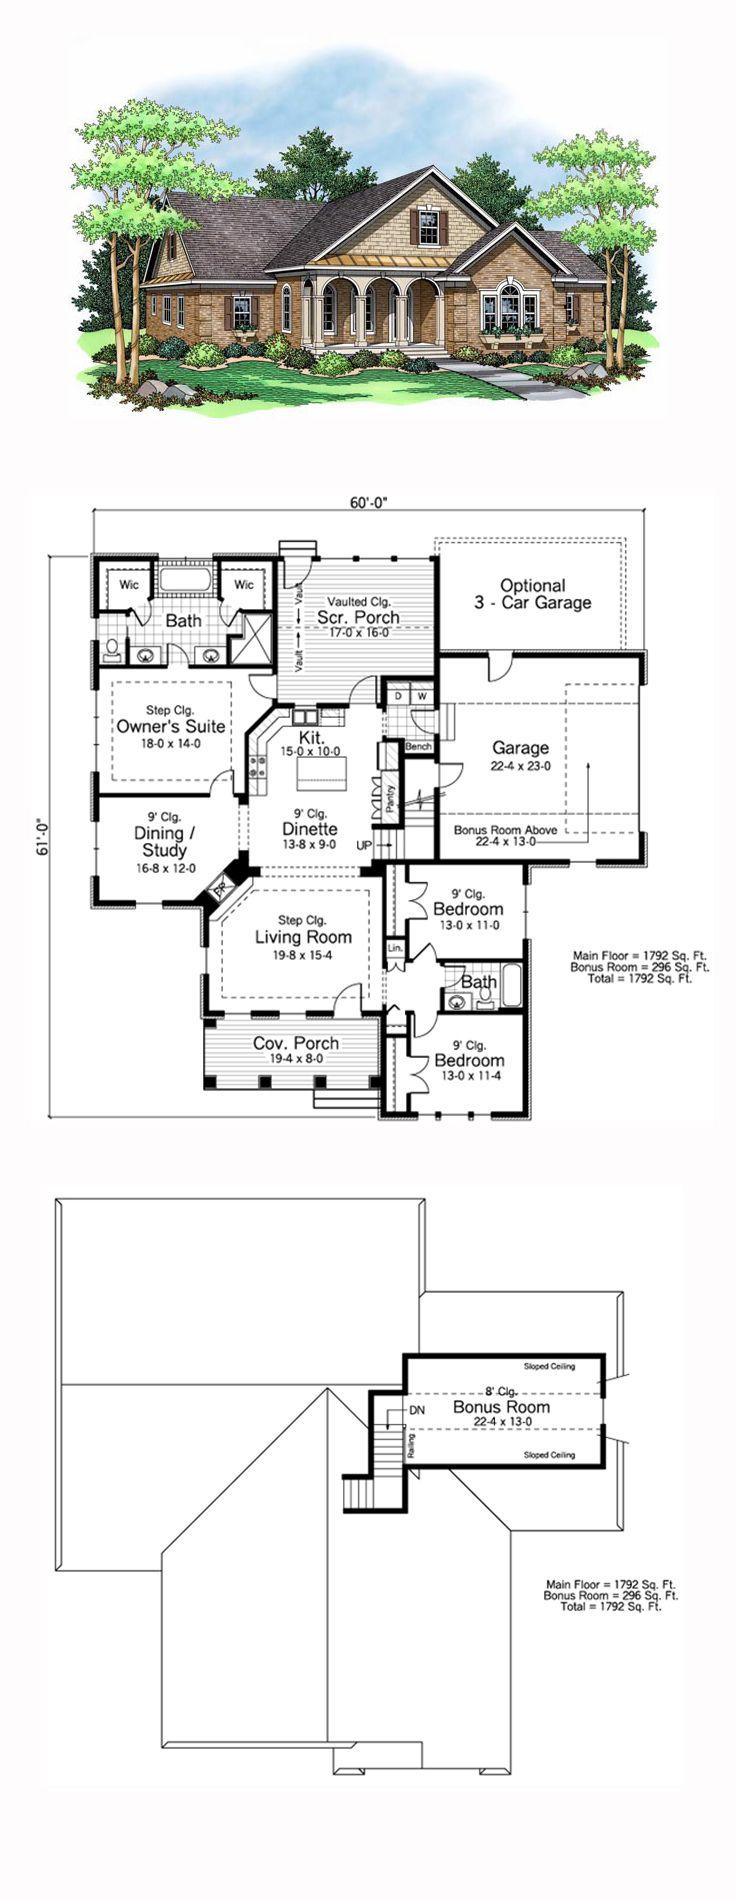 68 best european house plans images on pinterest european house european ranch traditional house plan 42503 jameslax Image collections